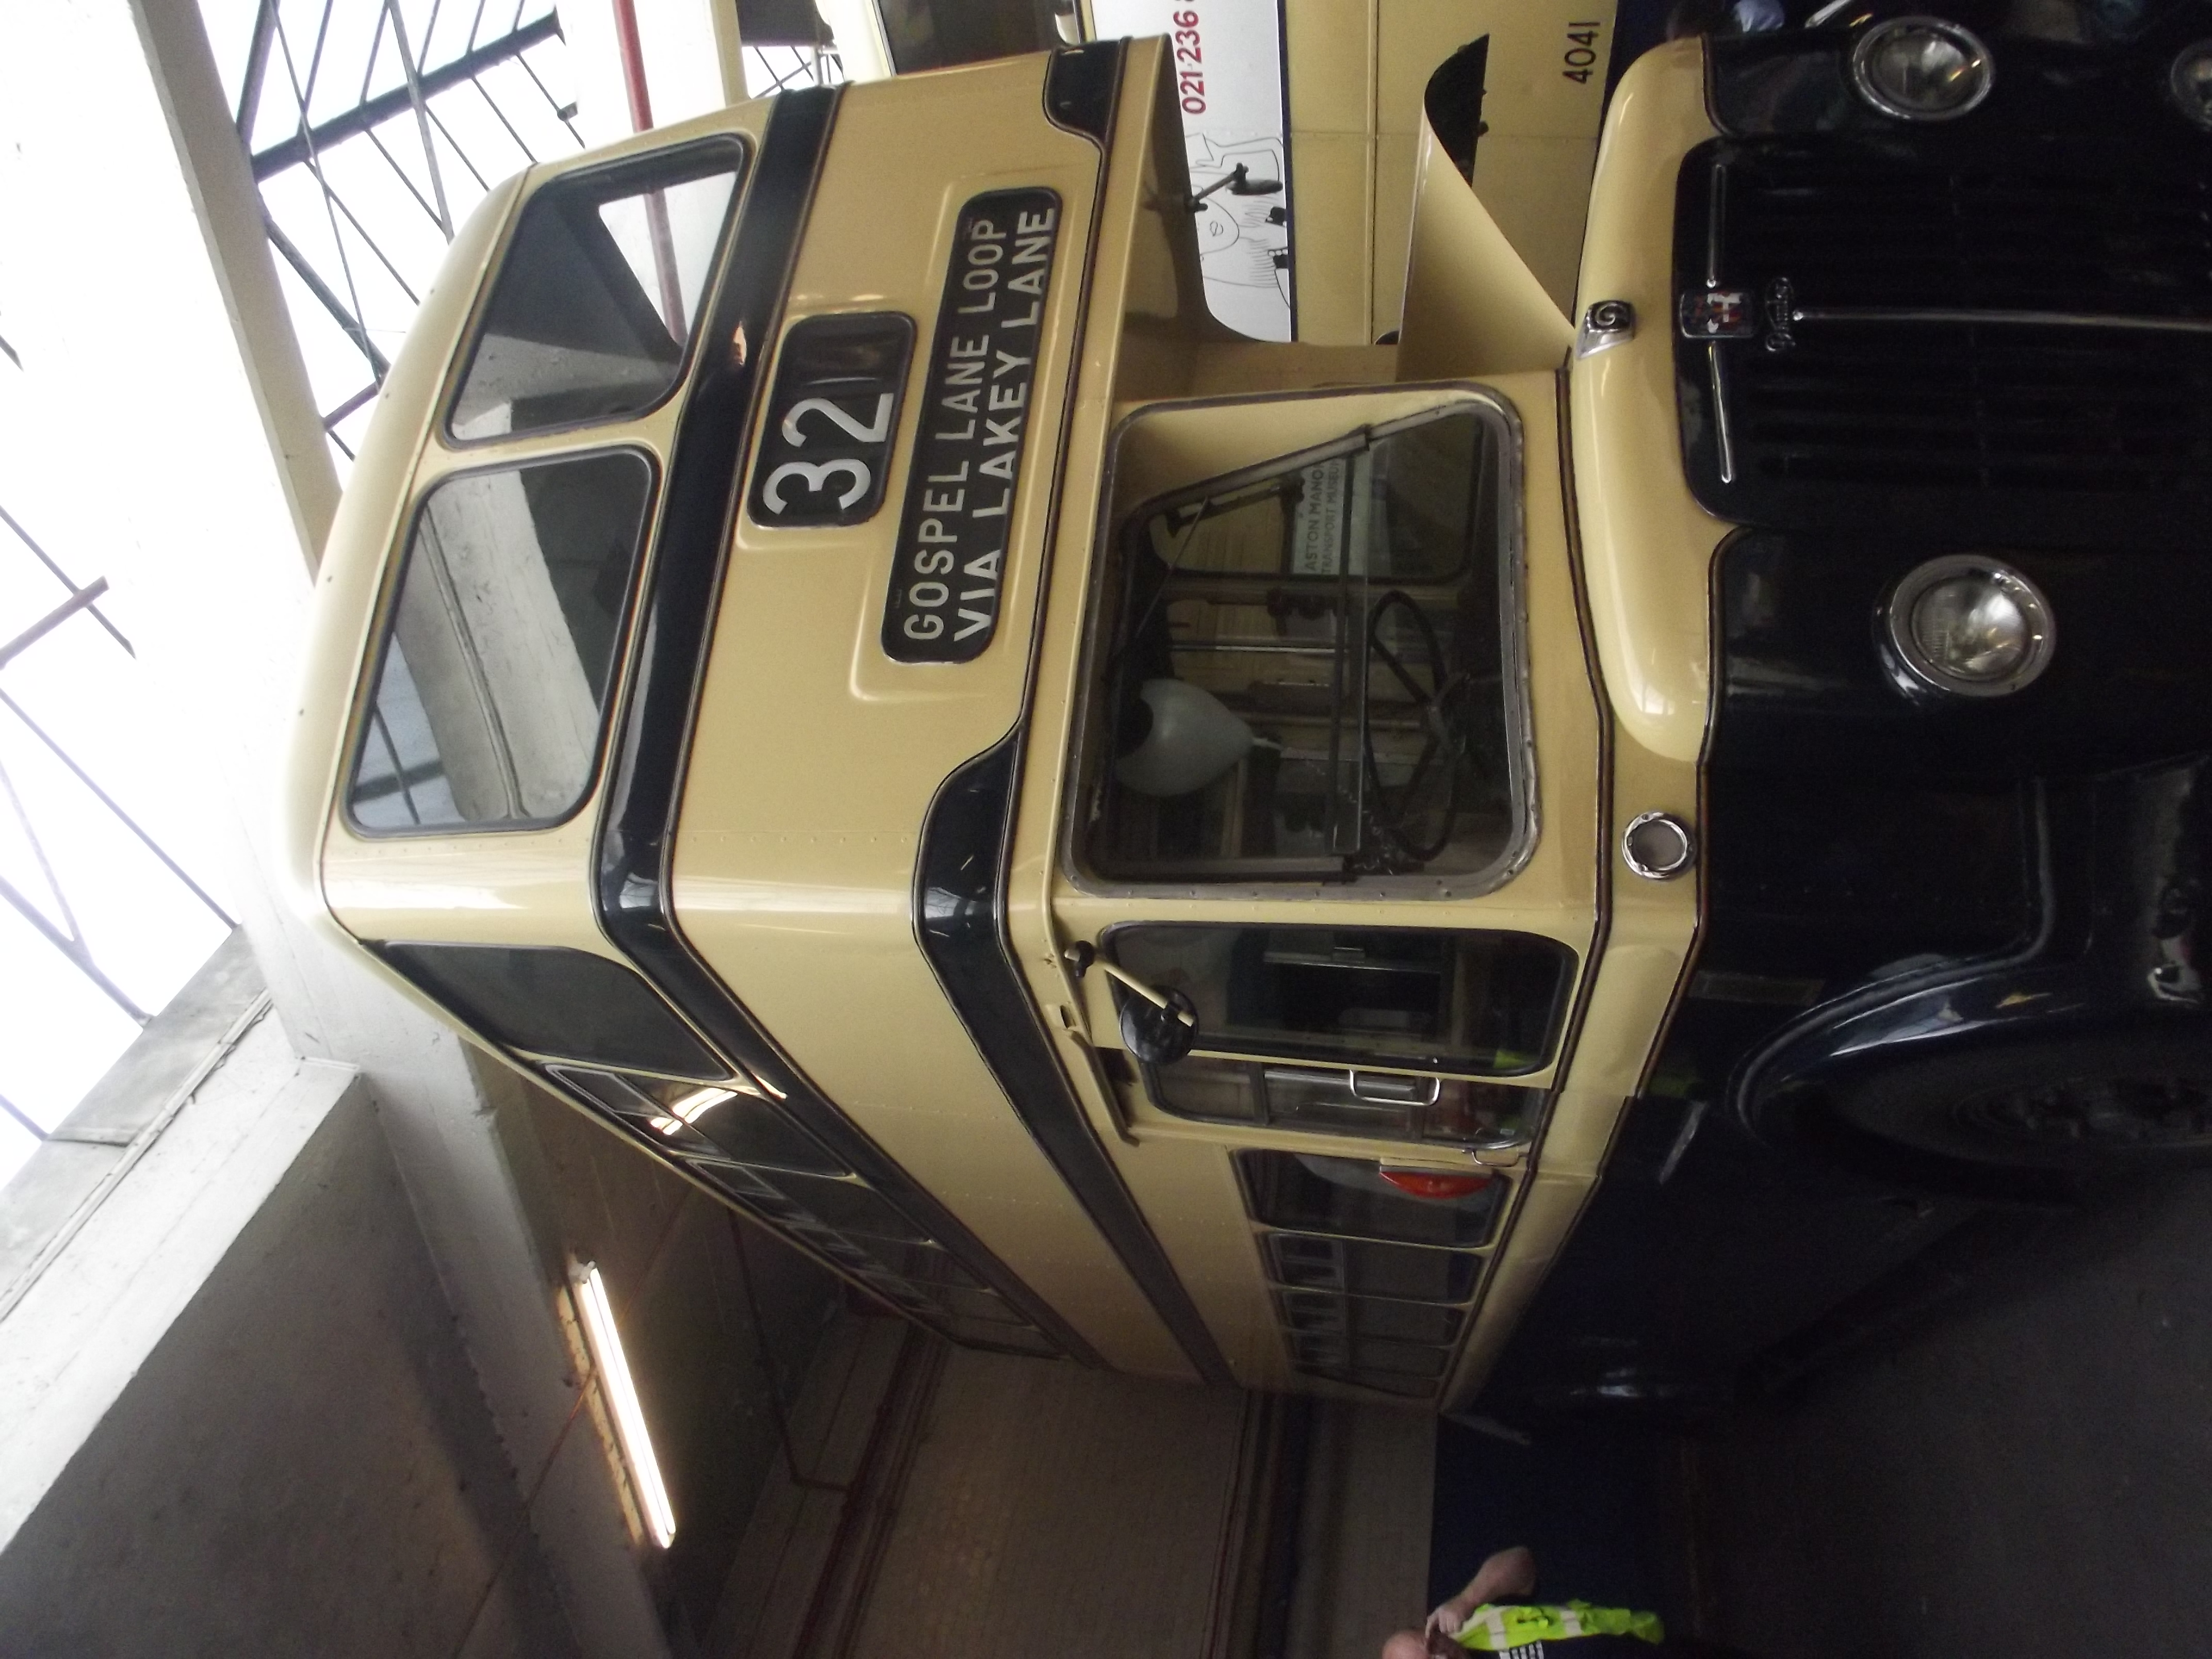 File:Acocks Green Bus Garage - Open Day - 32 - Gospel Lane Loop via